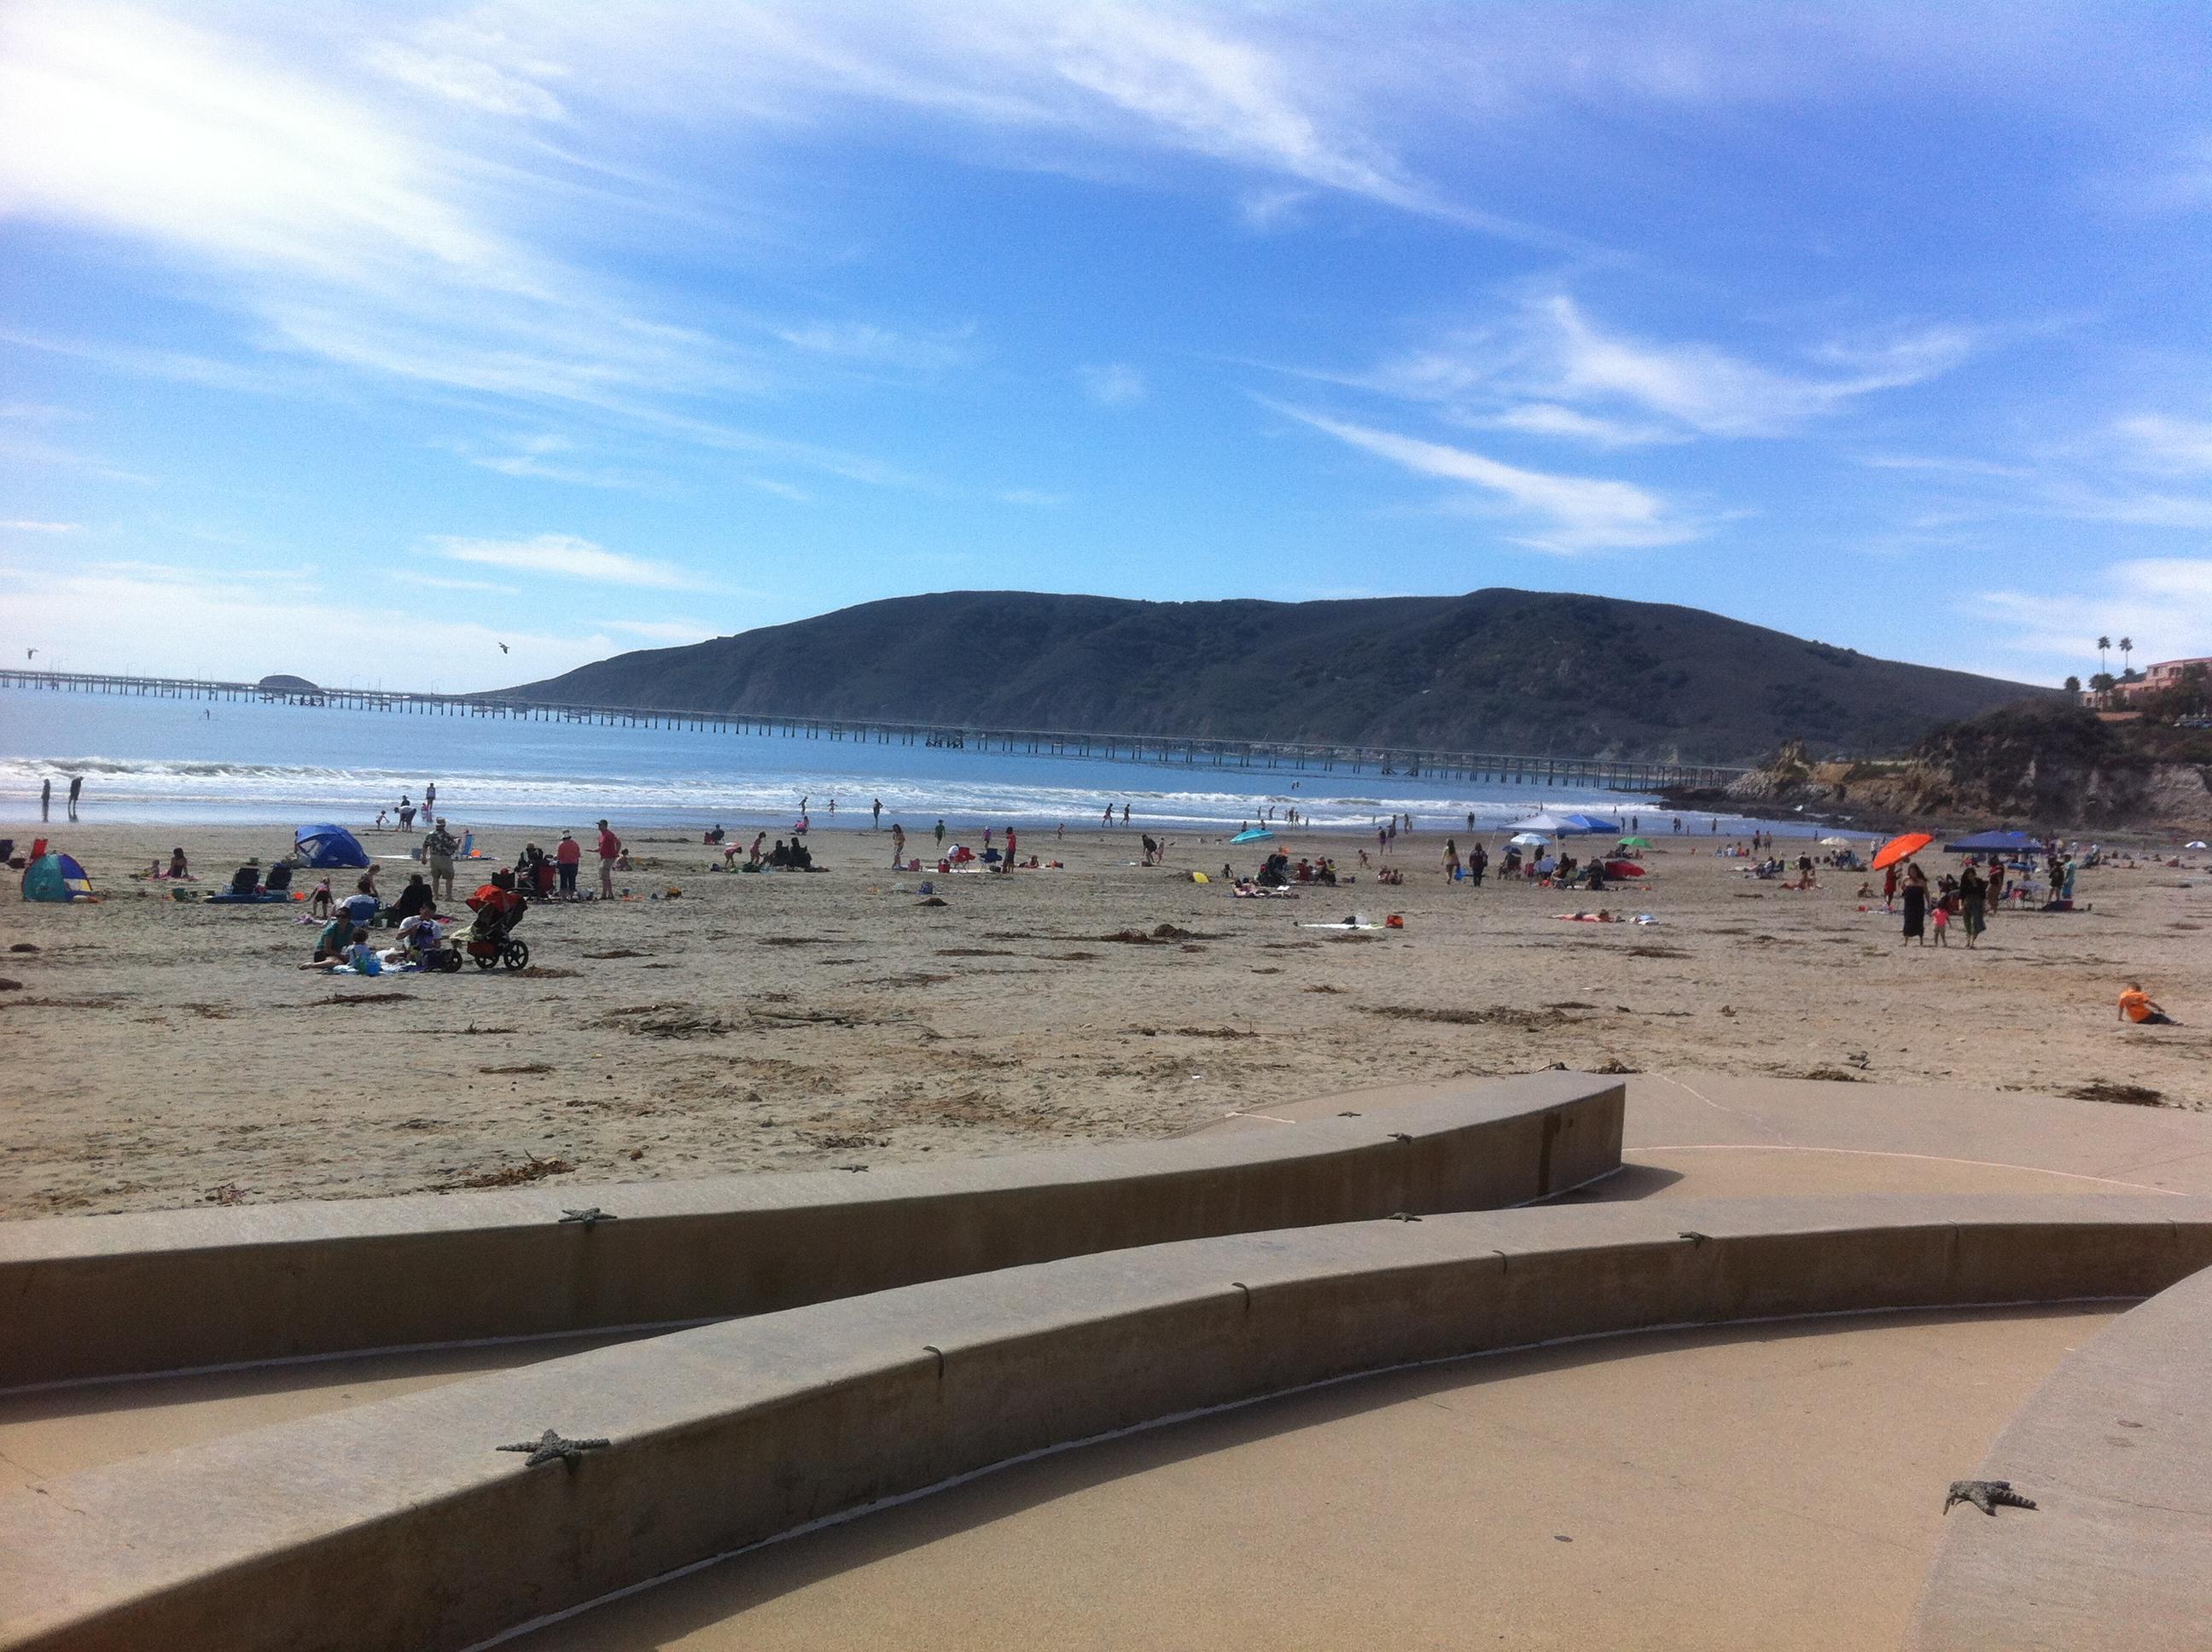 Relocating to Pismo Beach, Shell Beach Avila Beach